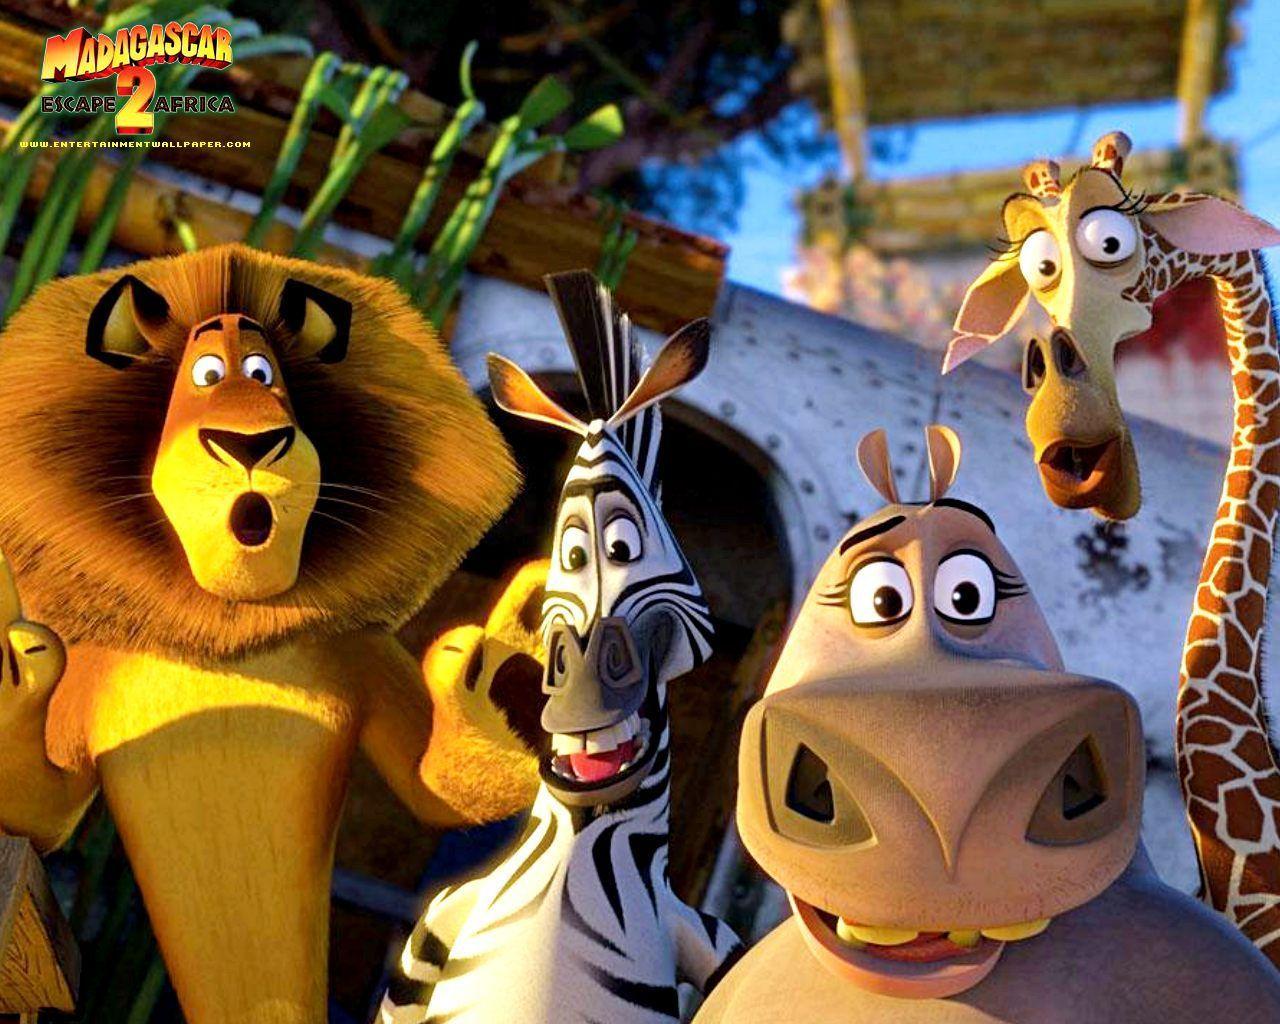 Madagascar 2 Cartoon Characters : Madagascar escape africa images hd